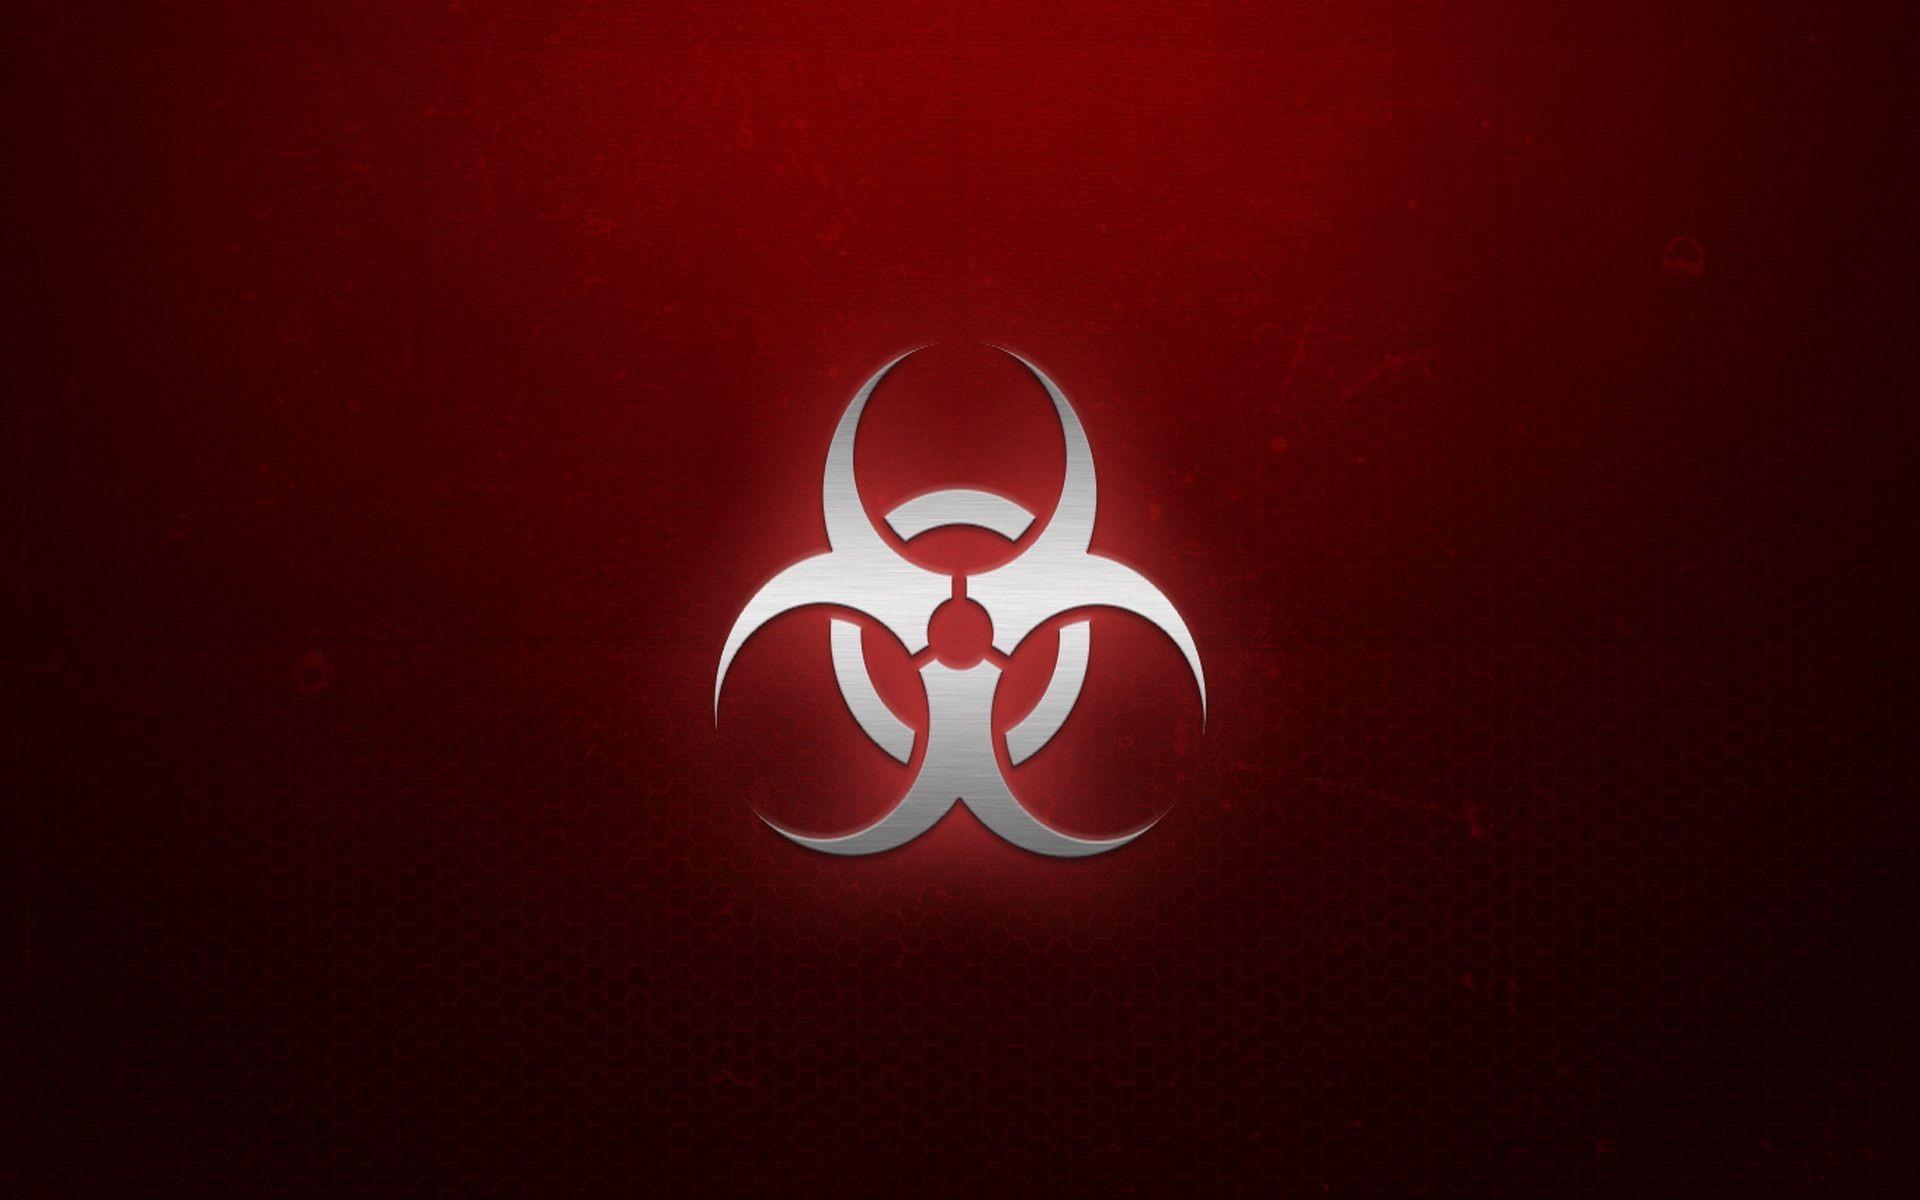 Image Biohazard Symbol